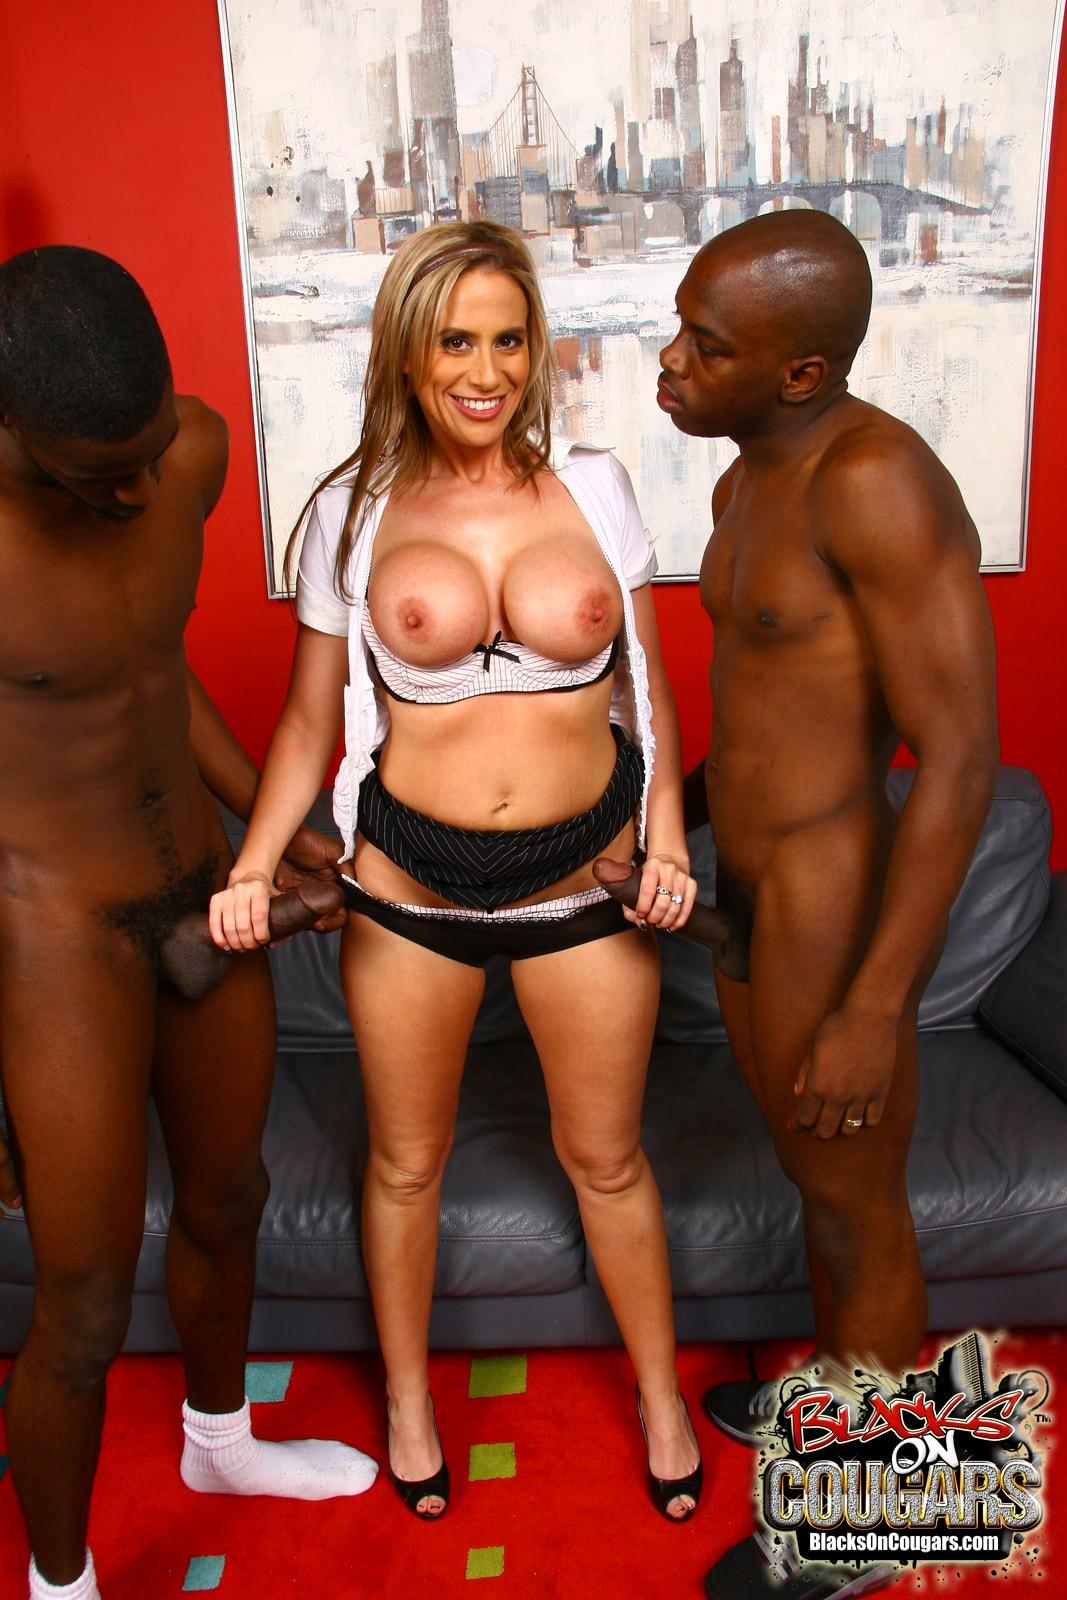 Dogfart '- Blacks On Cougars' starring Kylie Worthy (Photo 14)